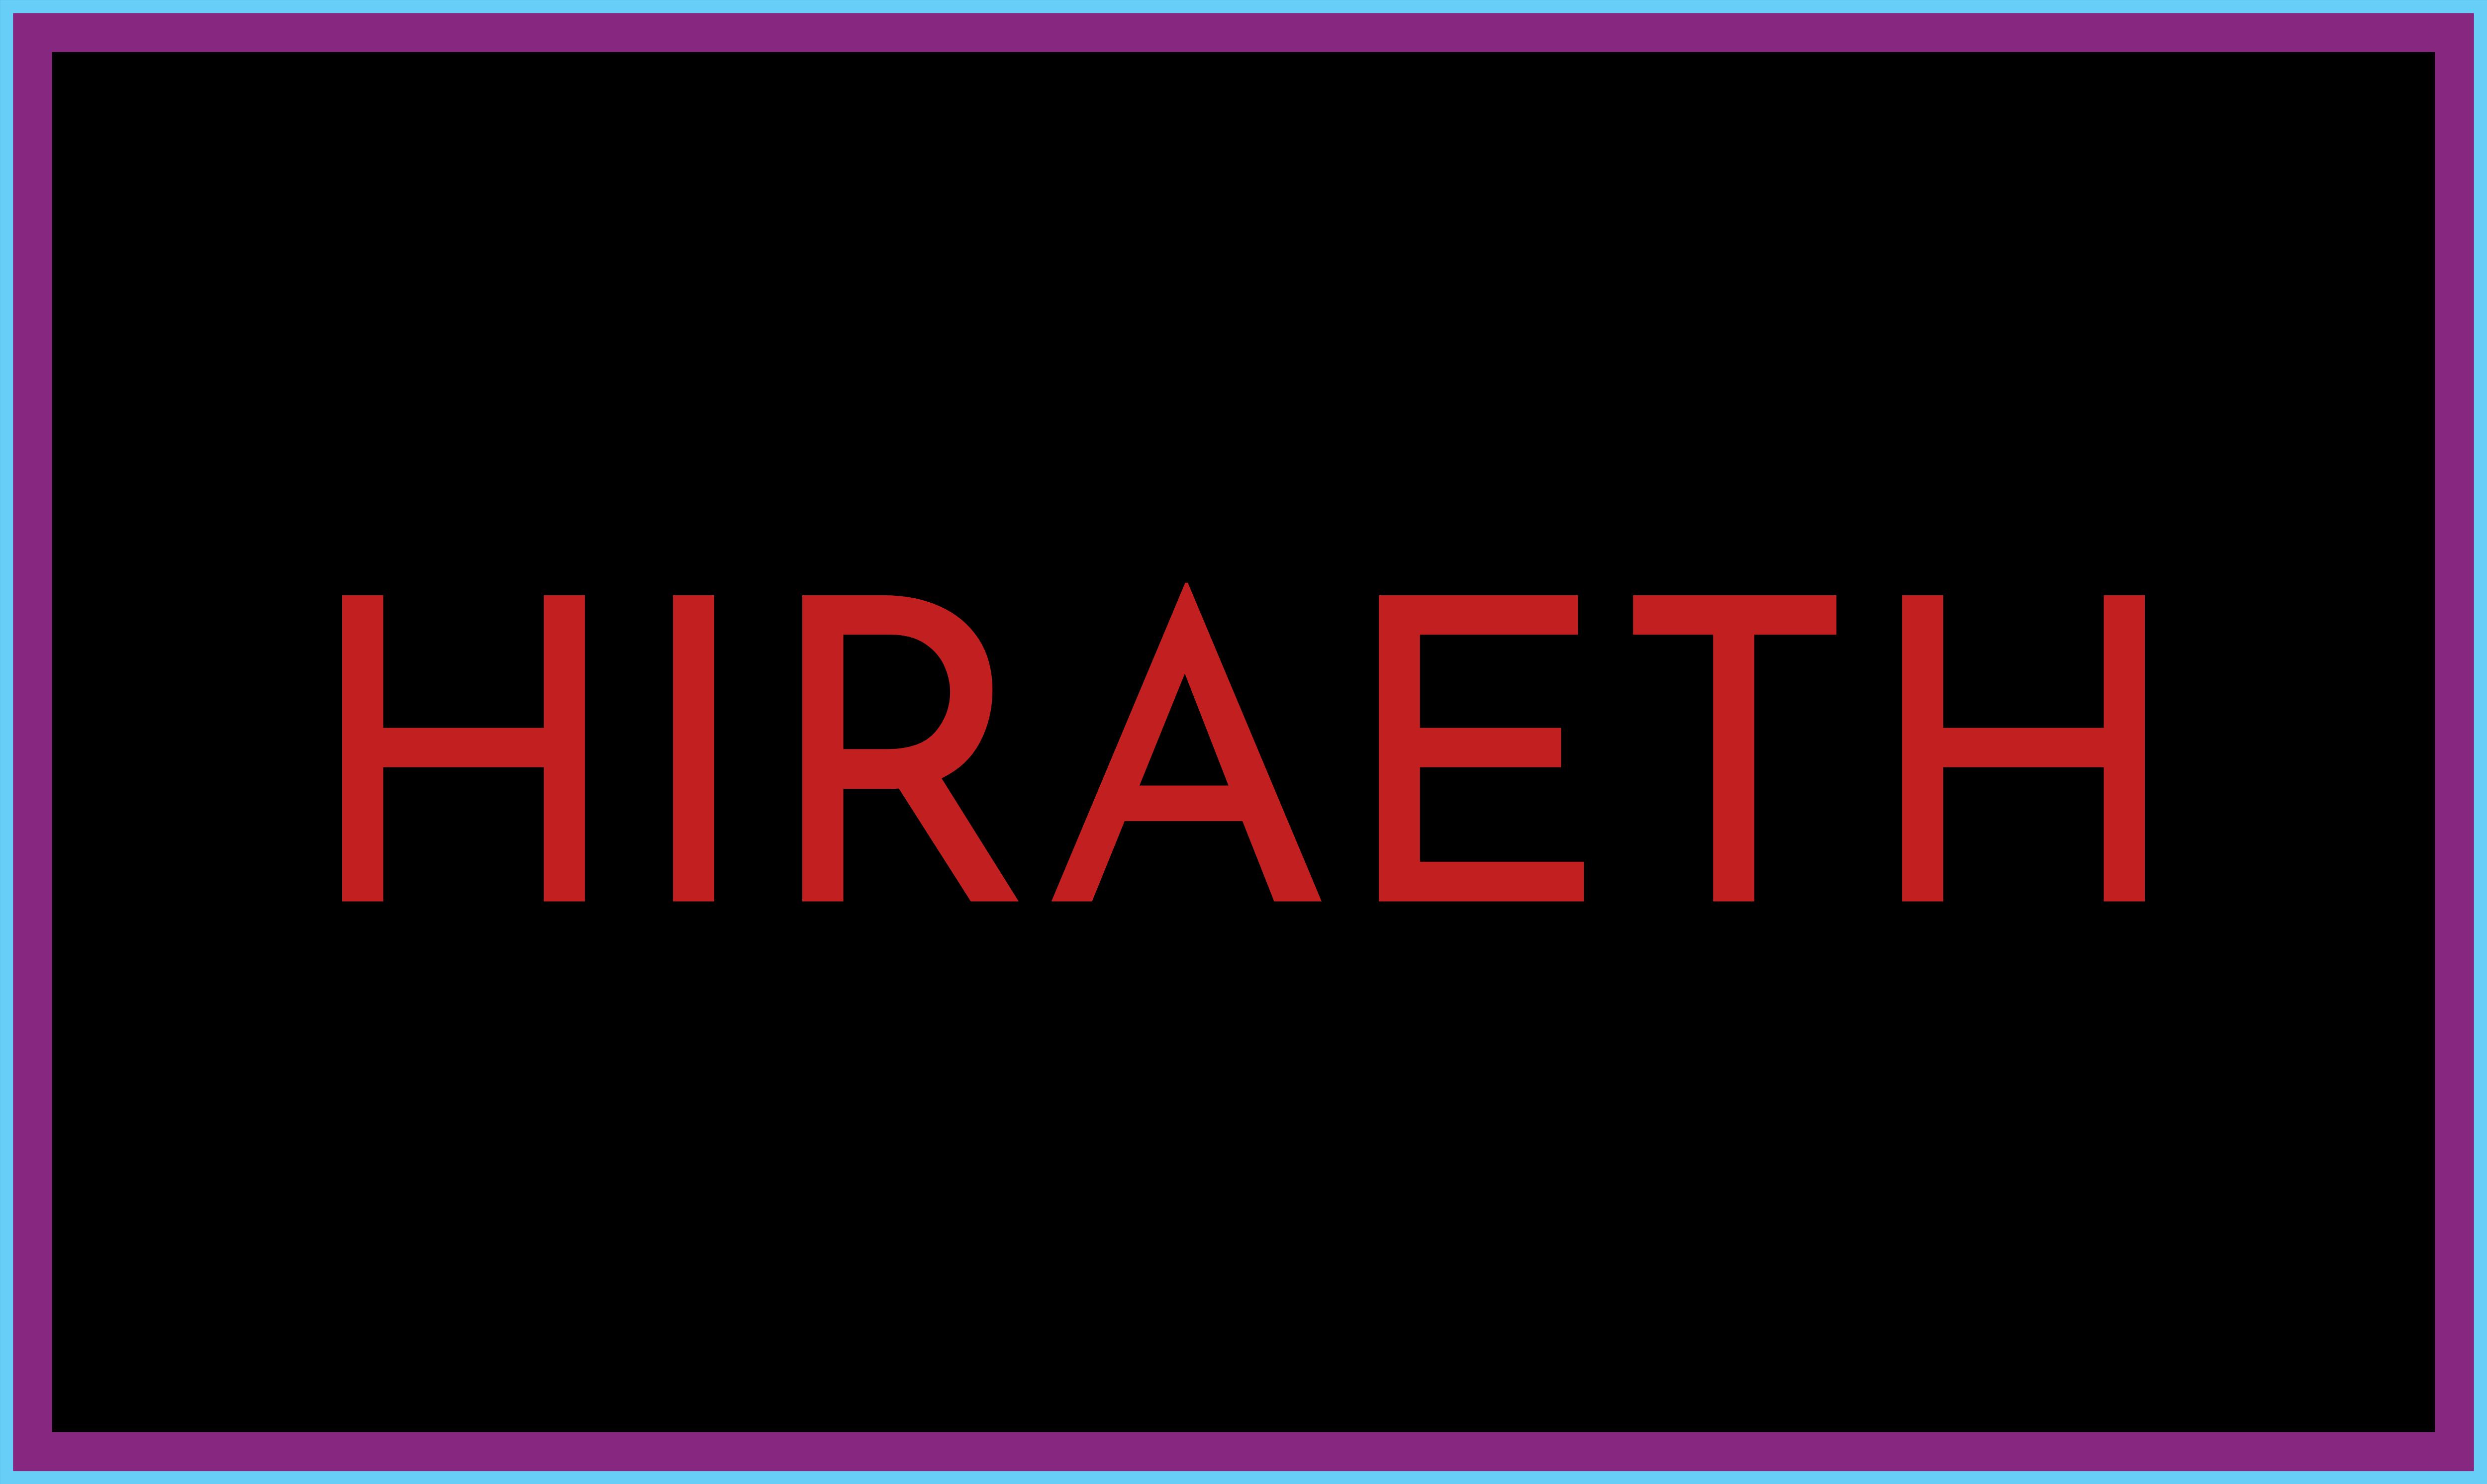 Hiraethvinos